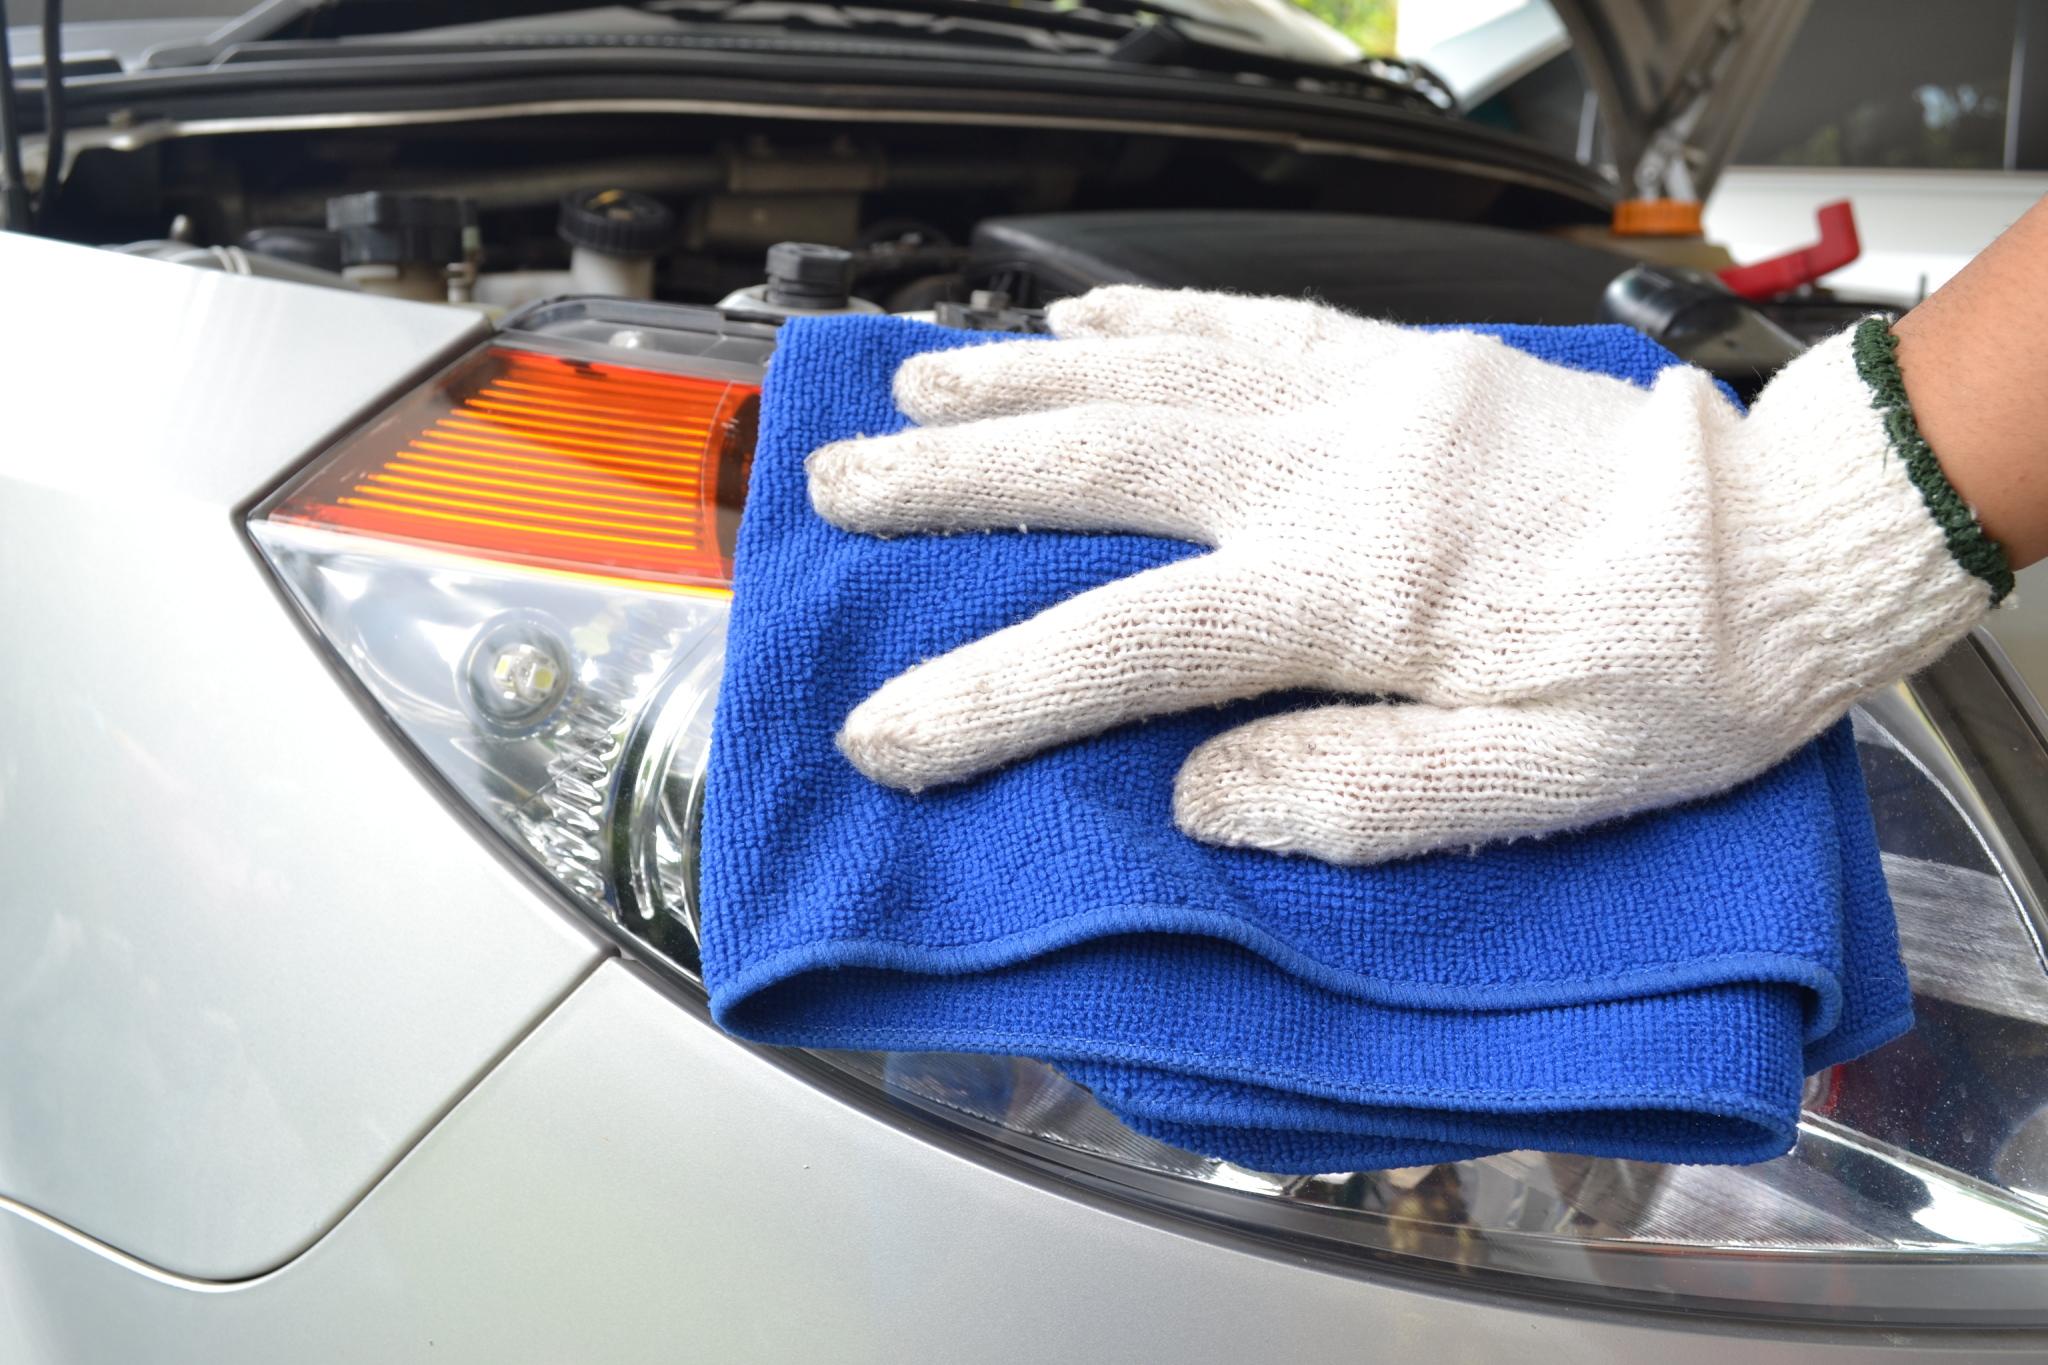 Automotive Wipes